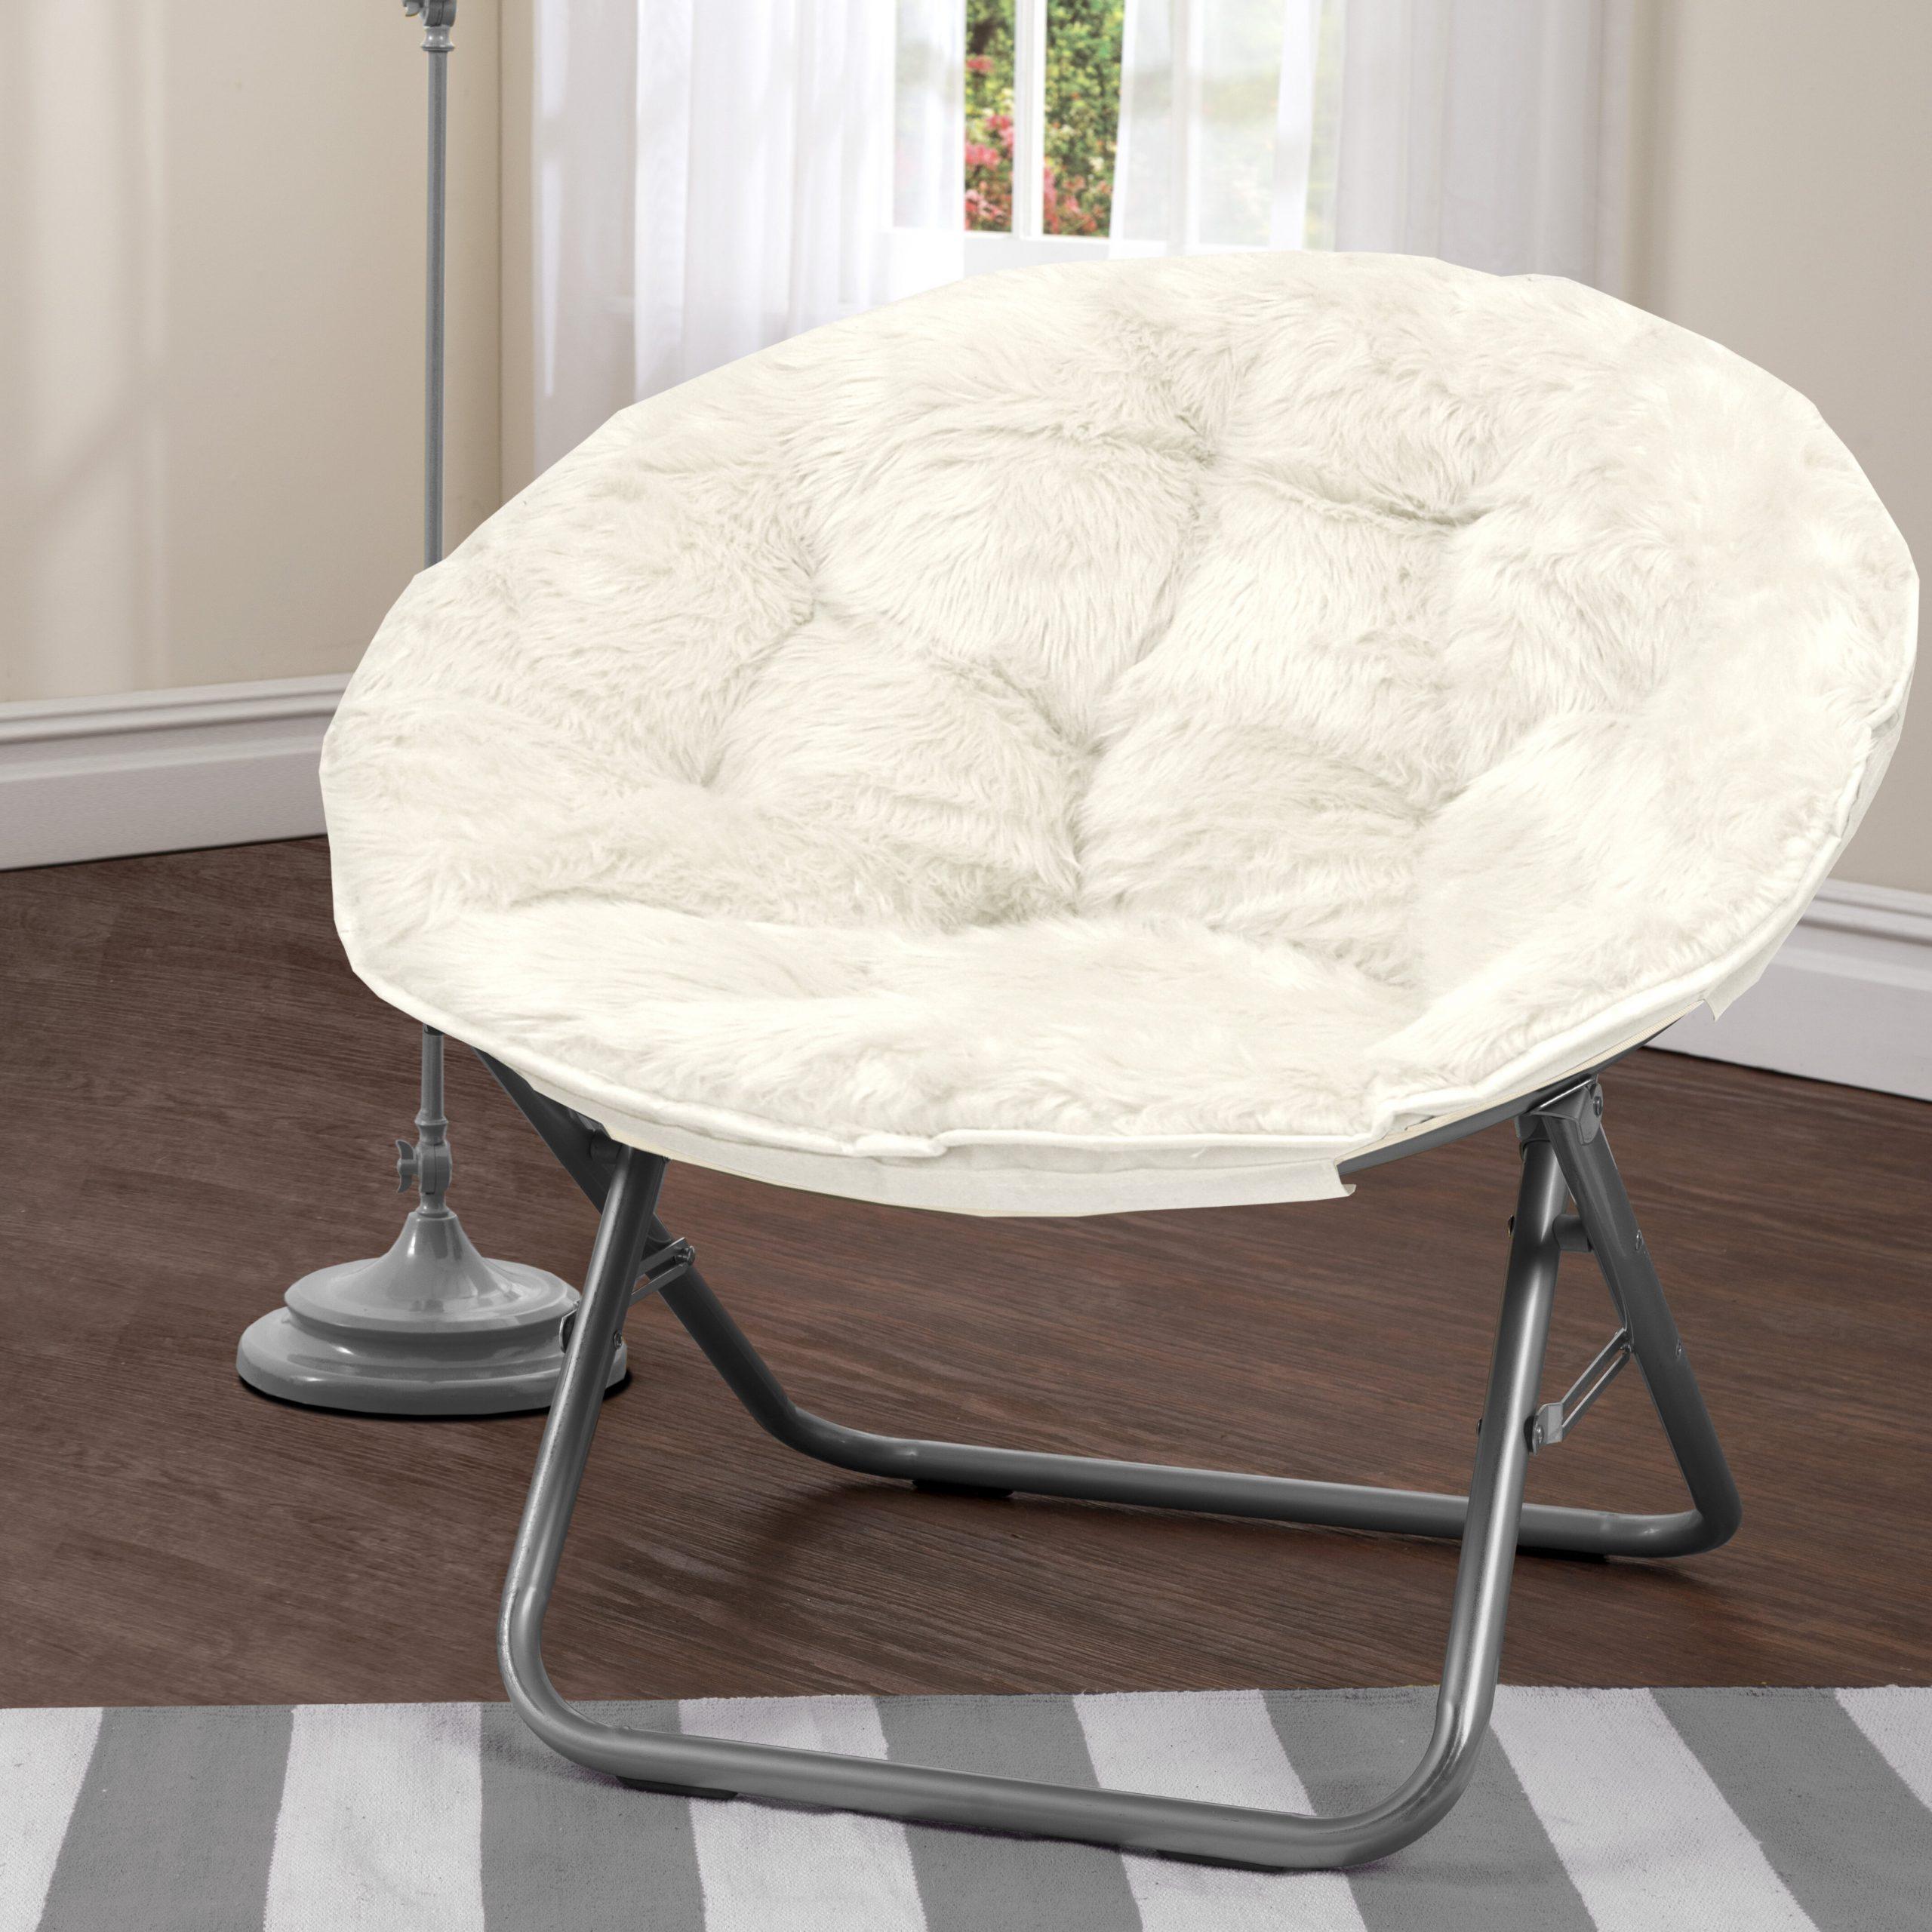 Papasan Chairs | Wayfair (View 8 of 15)